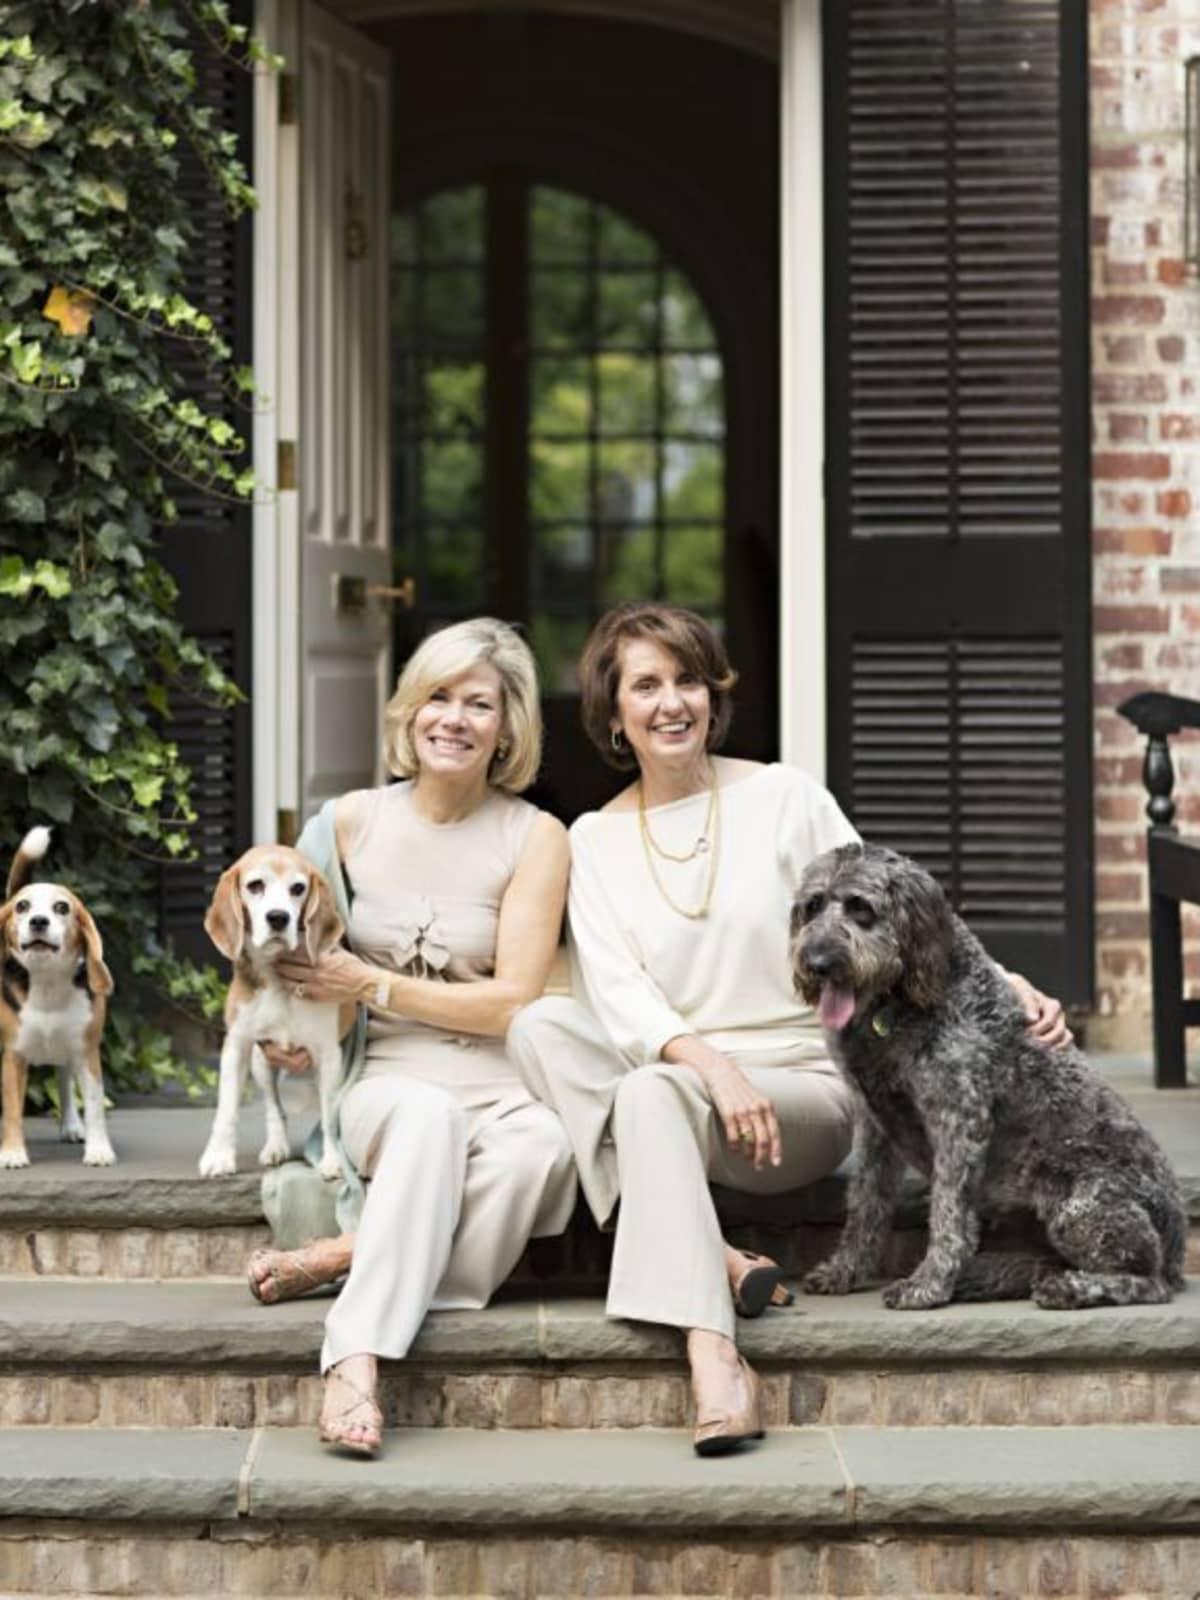 Houston Design Center 2013 Annual Spring Market Keynote: Jane Schwab & Cindy Smith